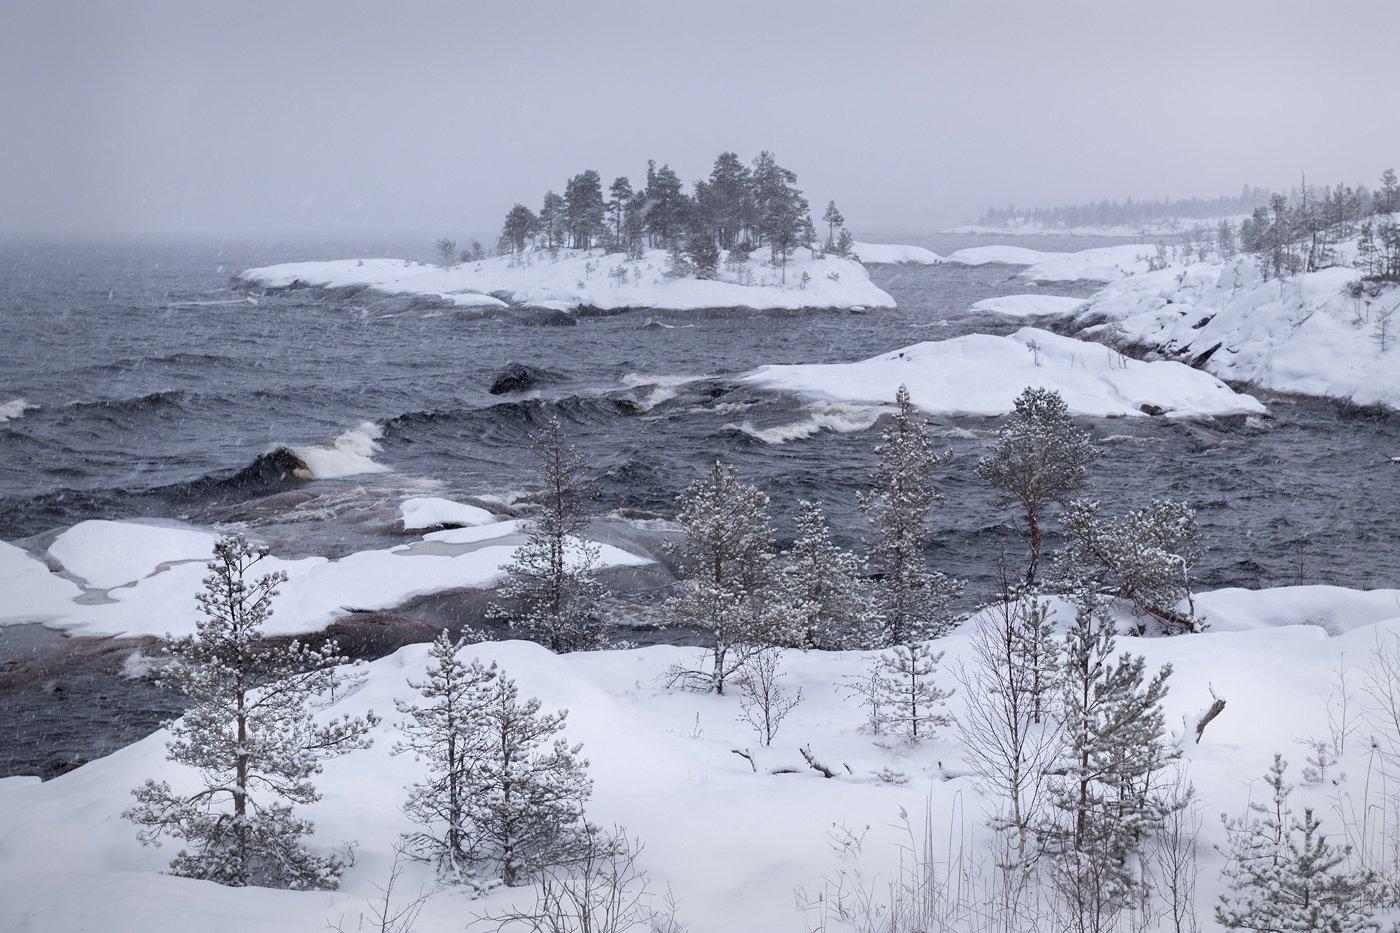 зимняя ладога, шхеры зимой, карелия, фототур, Арсений Кашкаров